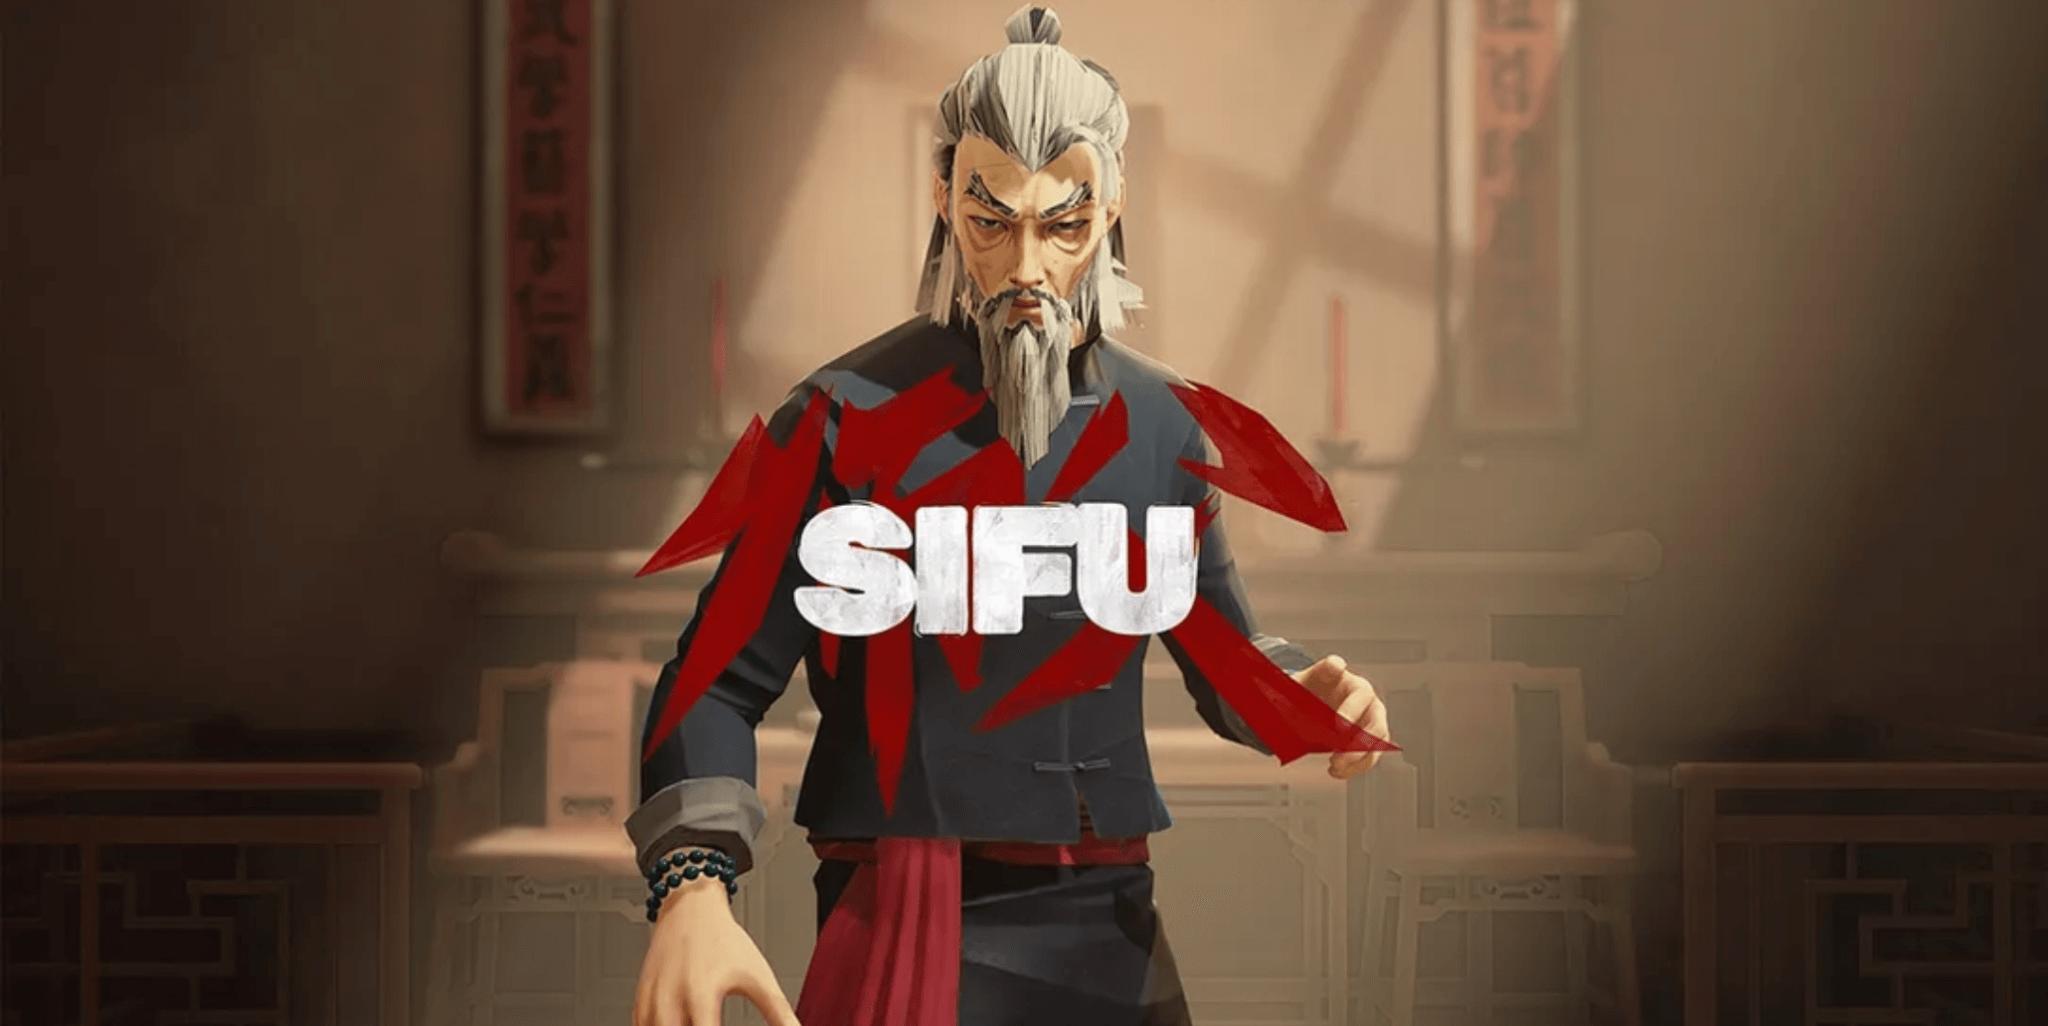 「SIFU」の発売日はいつ?予約特典と最新情報